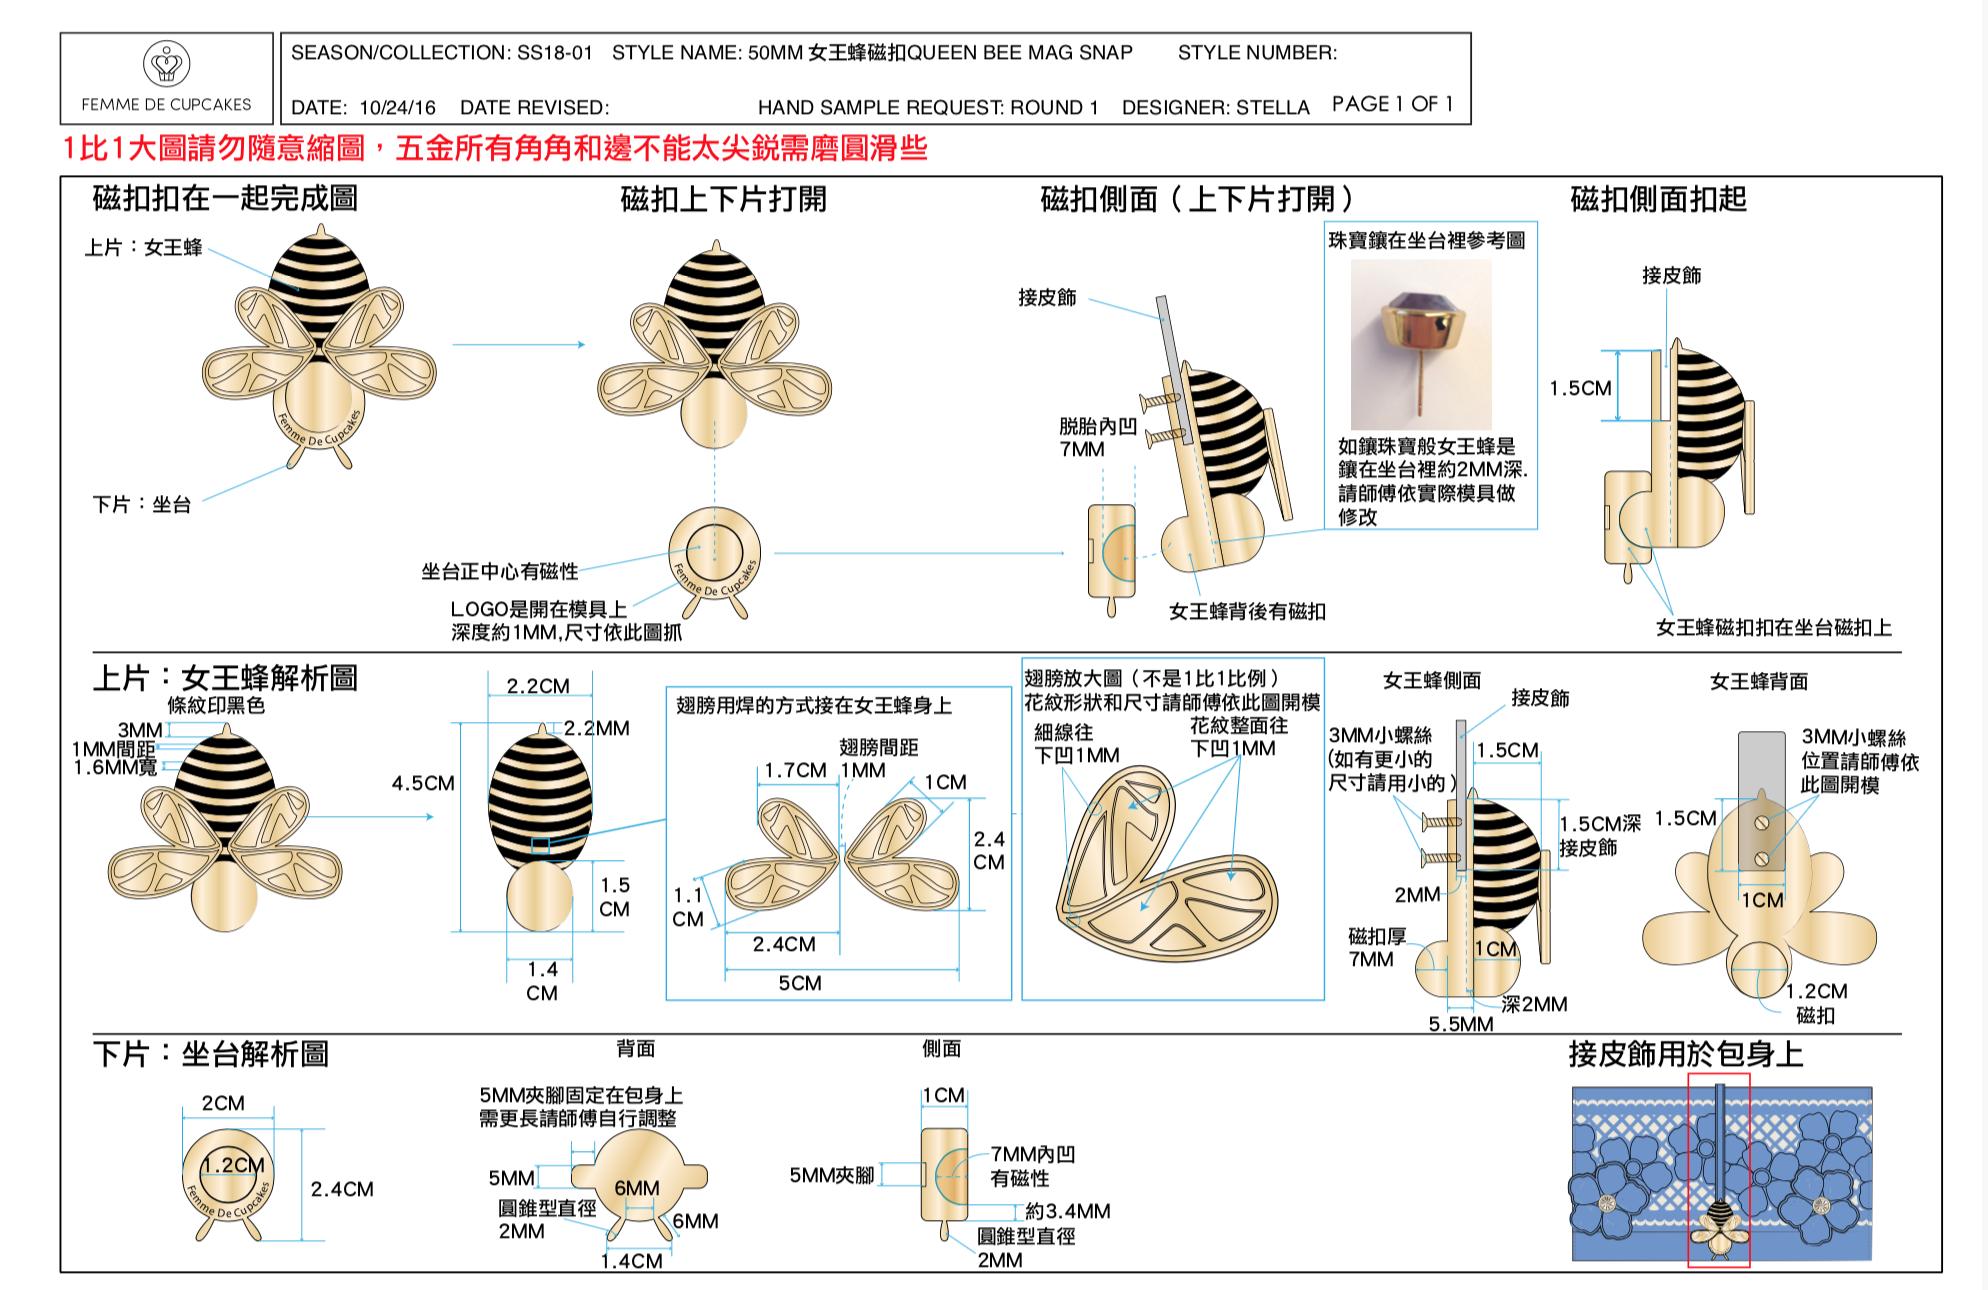 FULL SIZE HARDWARE SPEC (CHINESE)